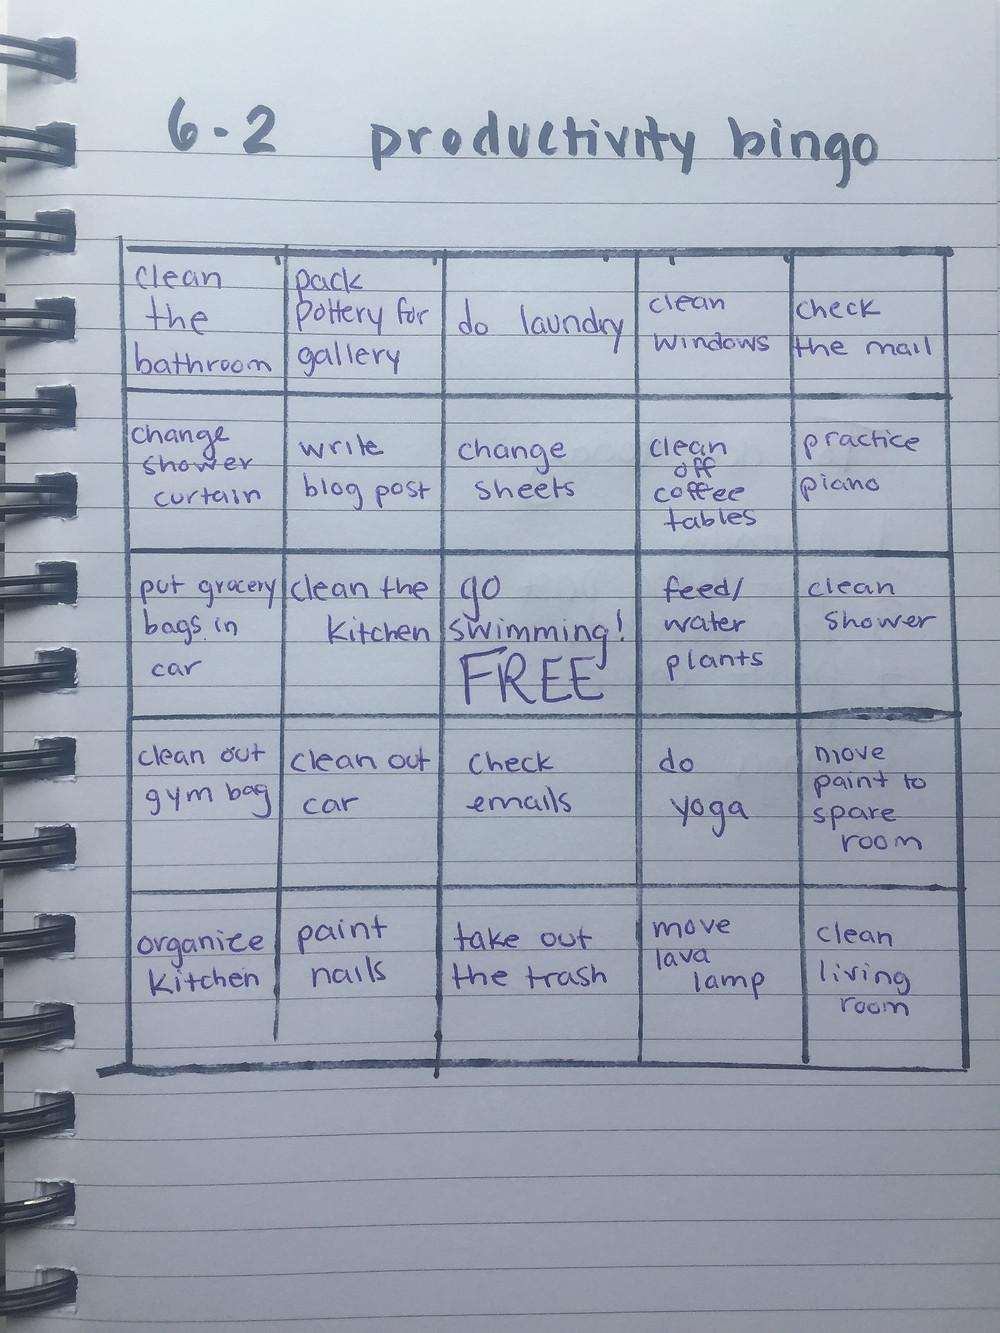 A productivity bingo board